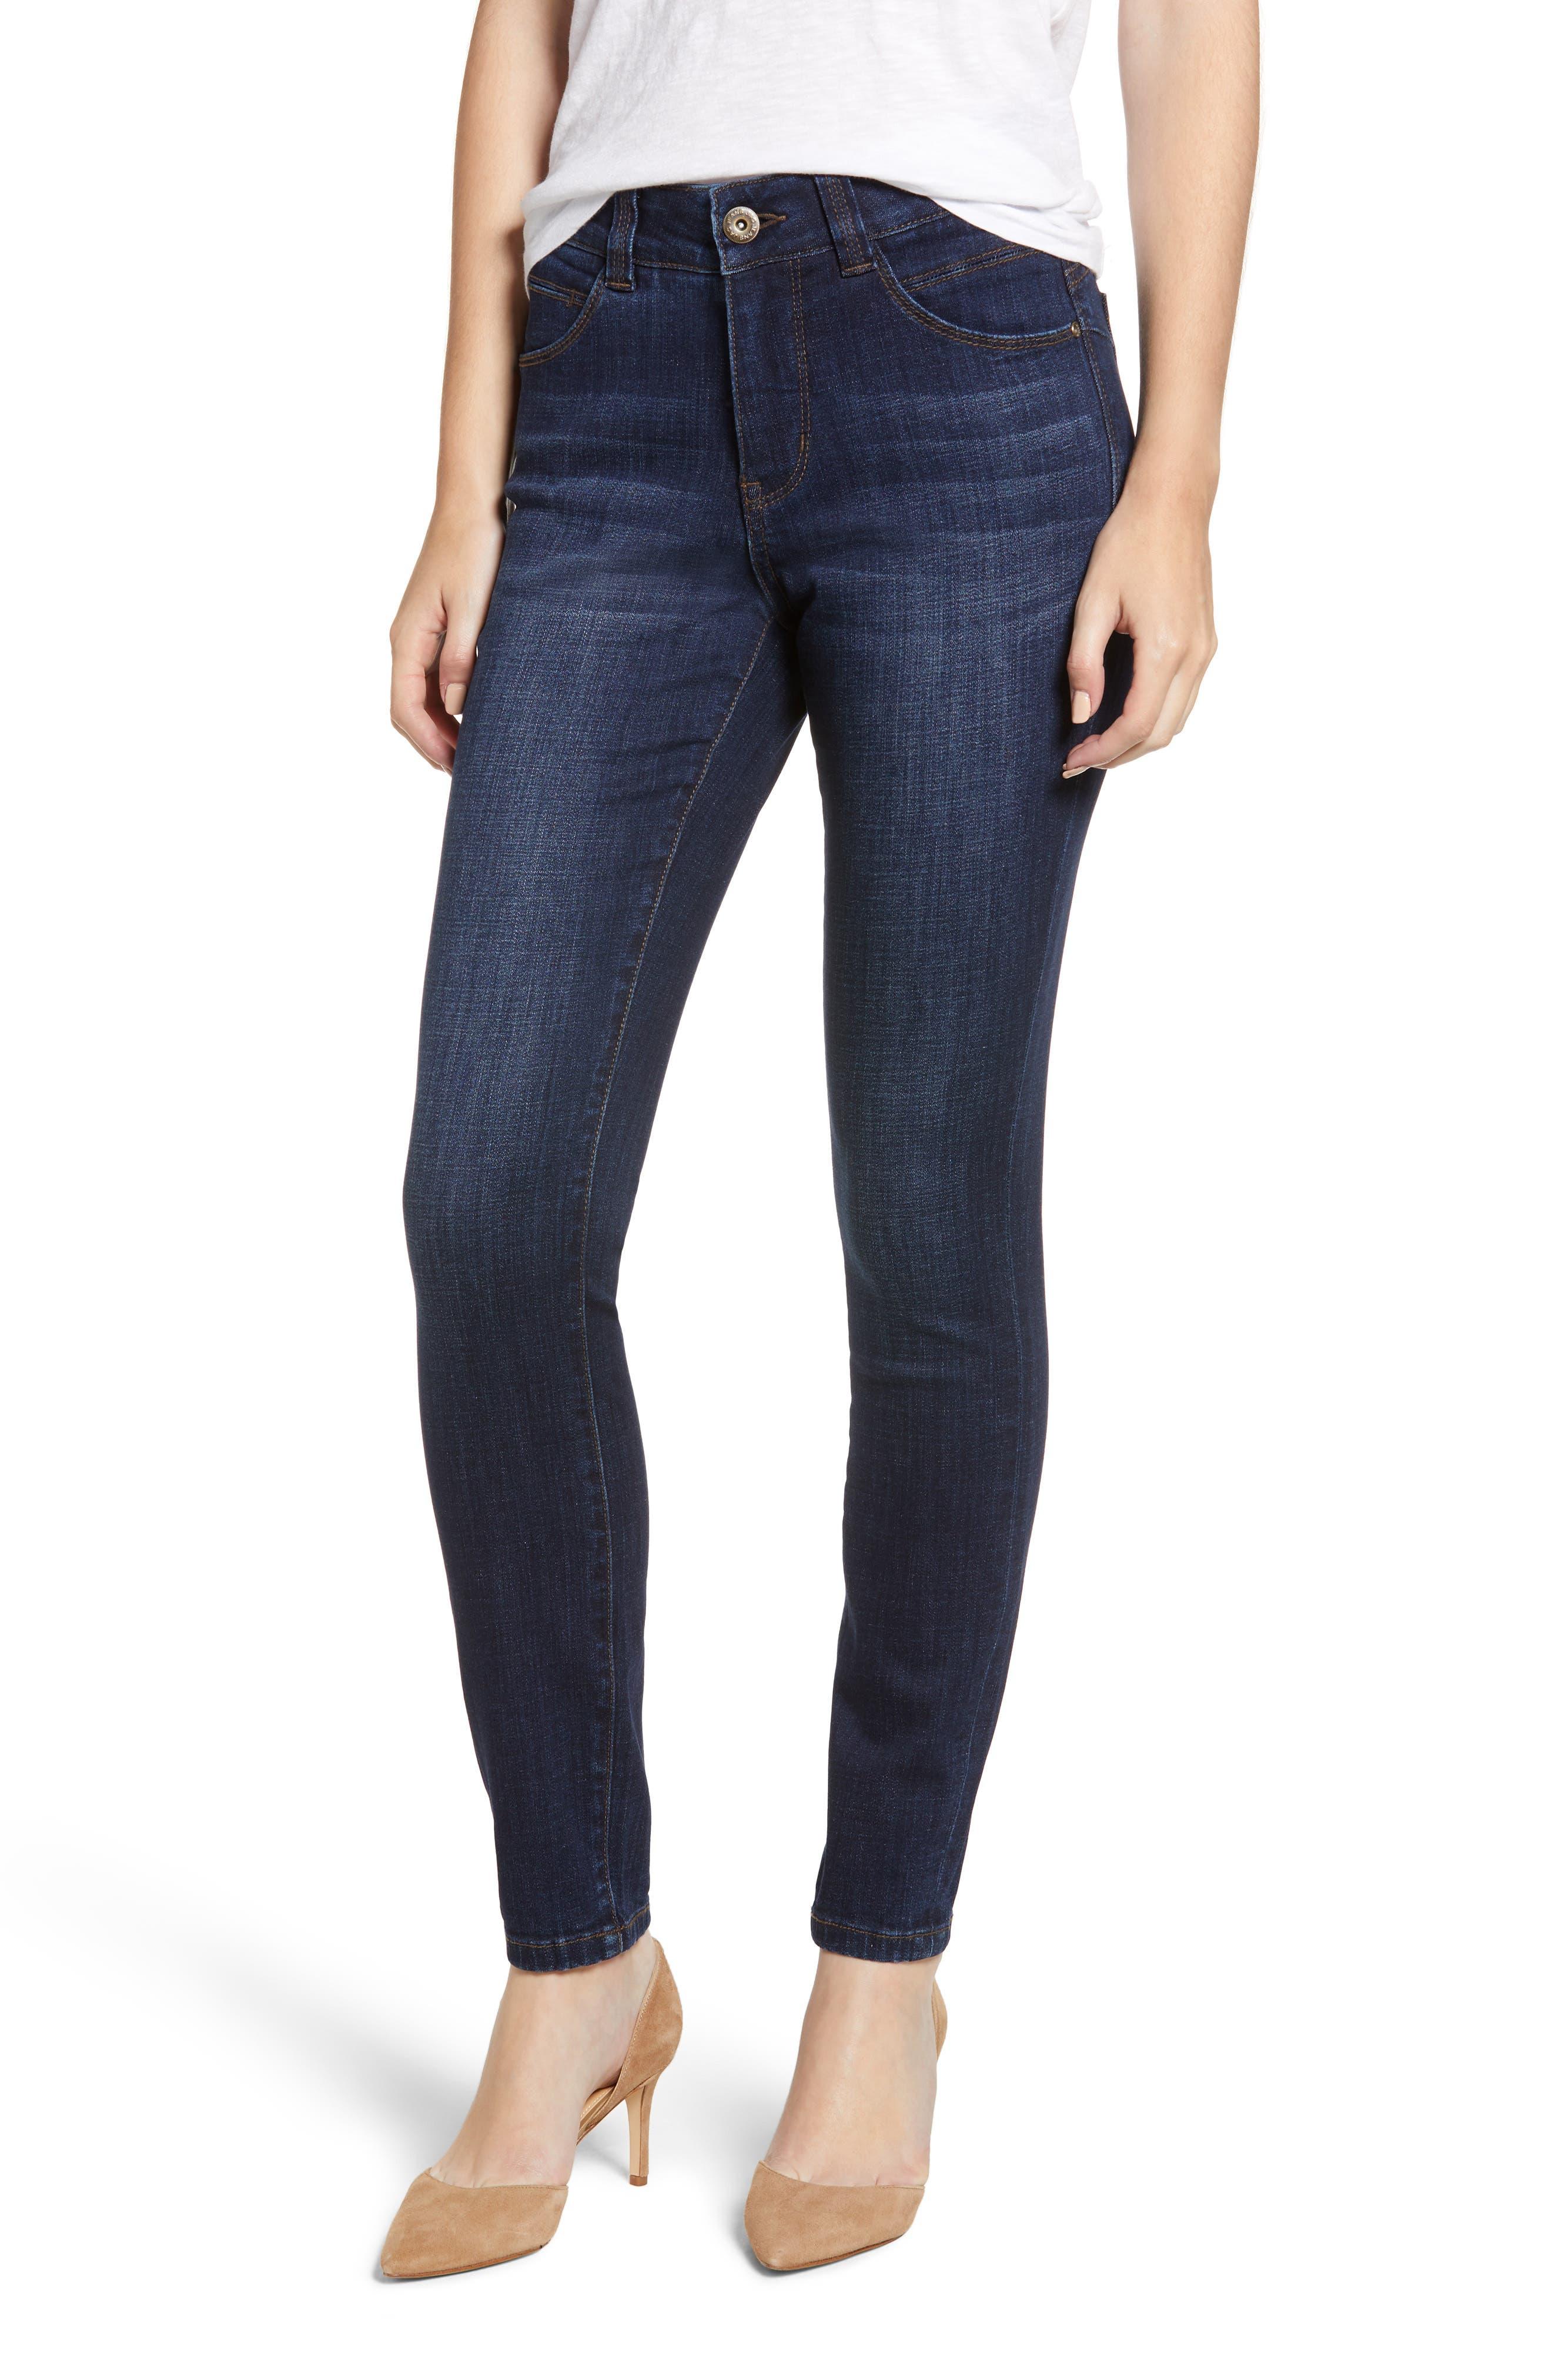 Cecilia Skinny Jeans In Medium Indigo in Med Indigo